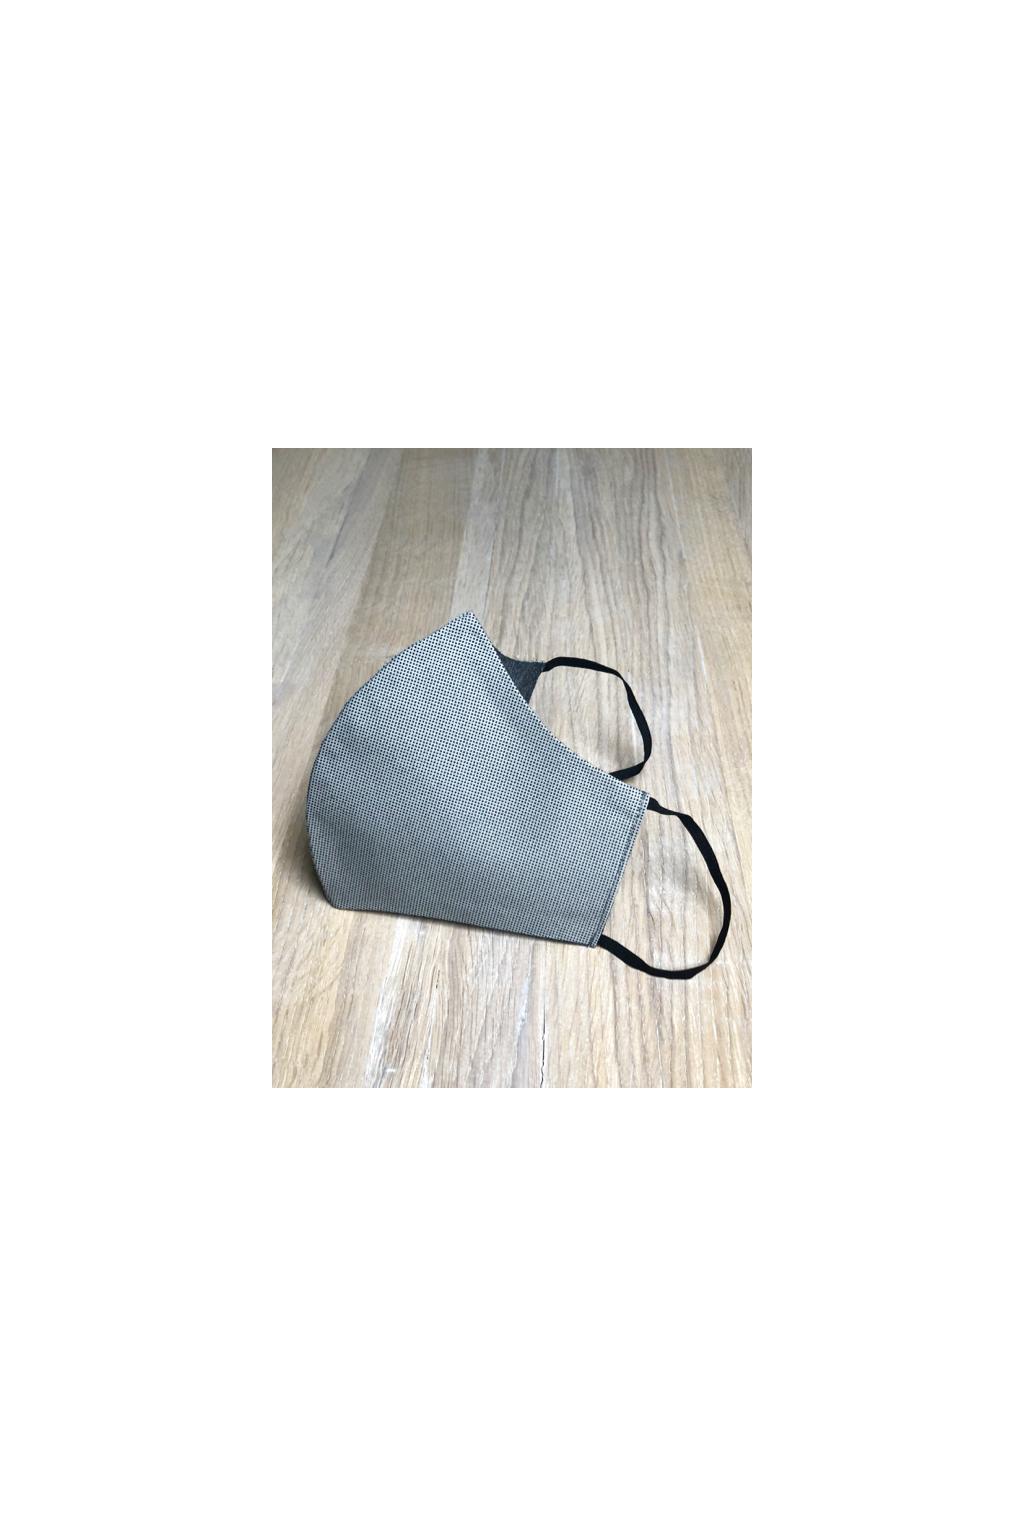 Pánská šedá rouška s jemným vzorem